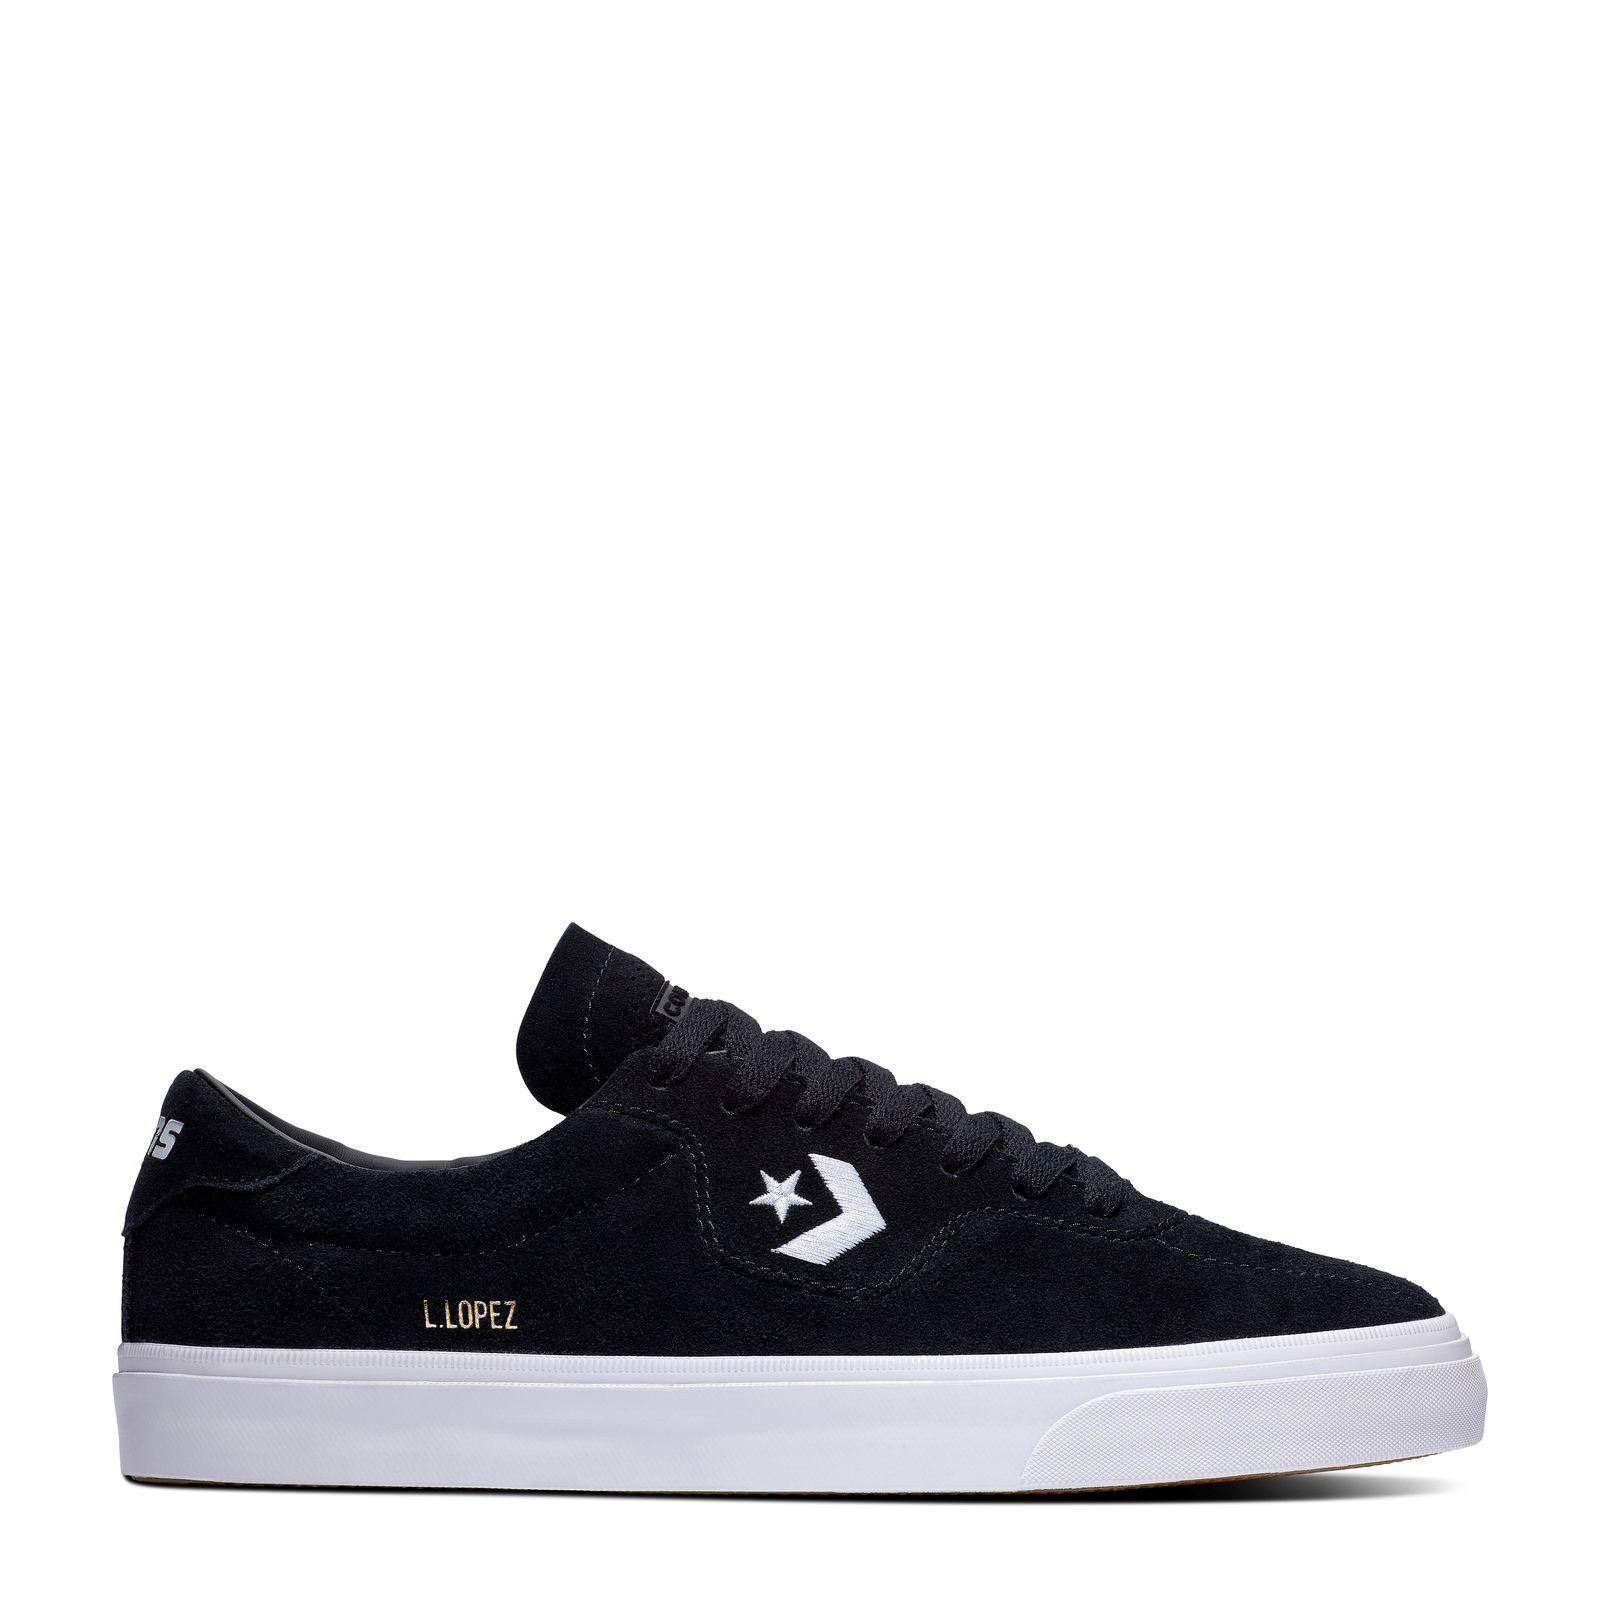 4de804bf43 Converse Philippines  Converse price list - Shoes for Men   Women ...